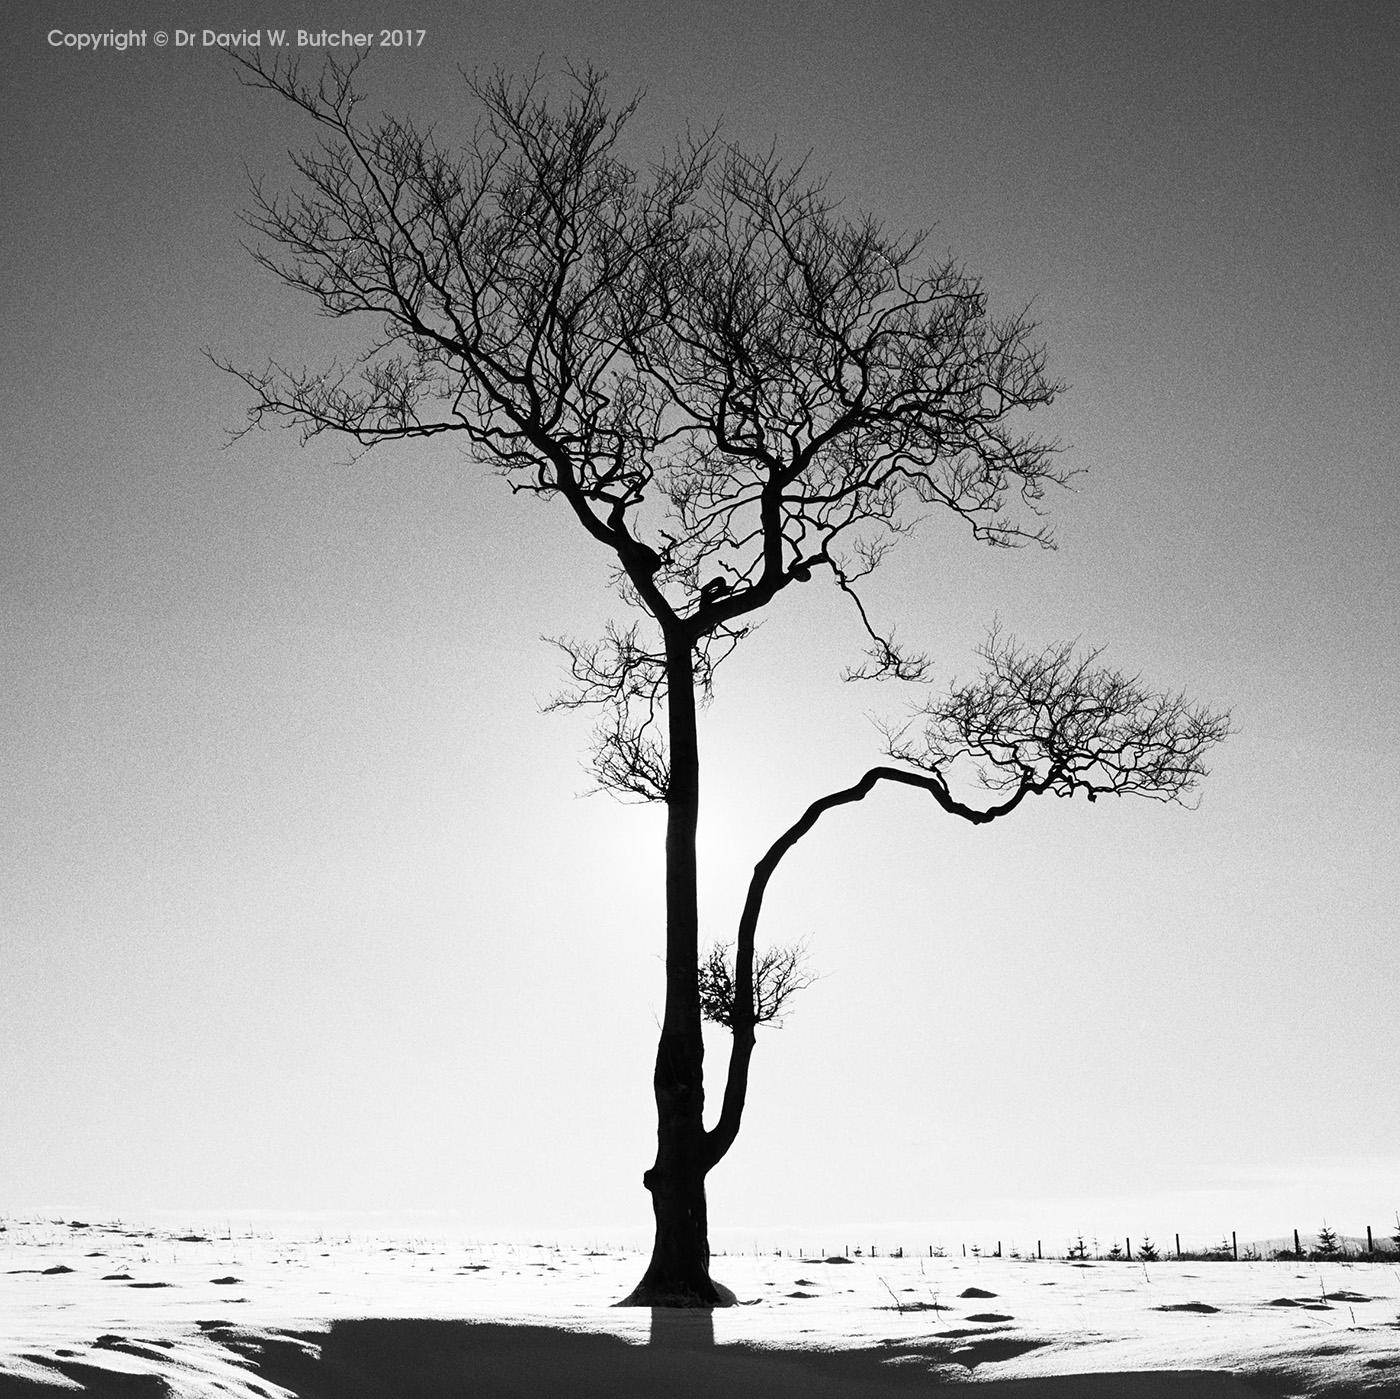 Lone Tree #1, Whaley Bridge, Peak District